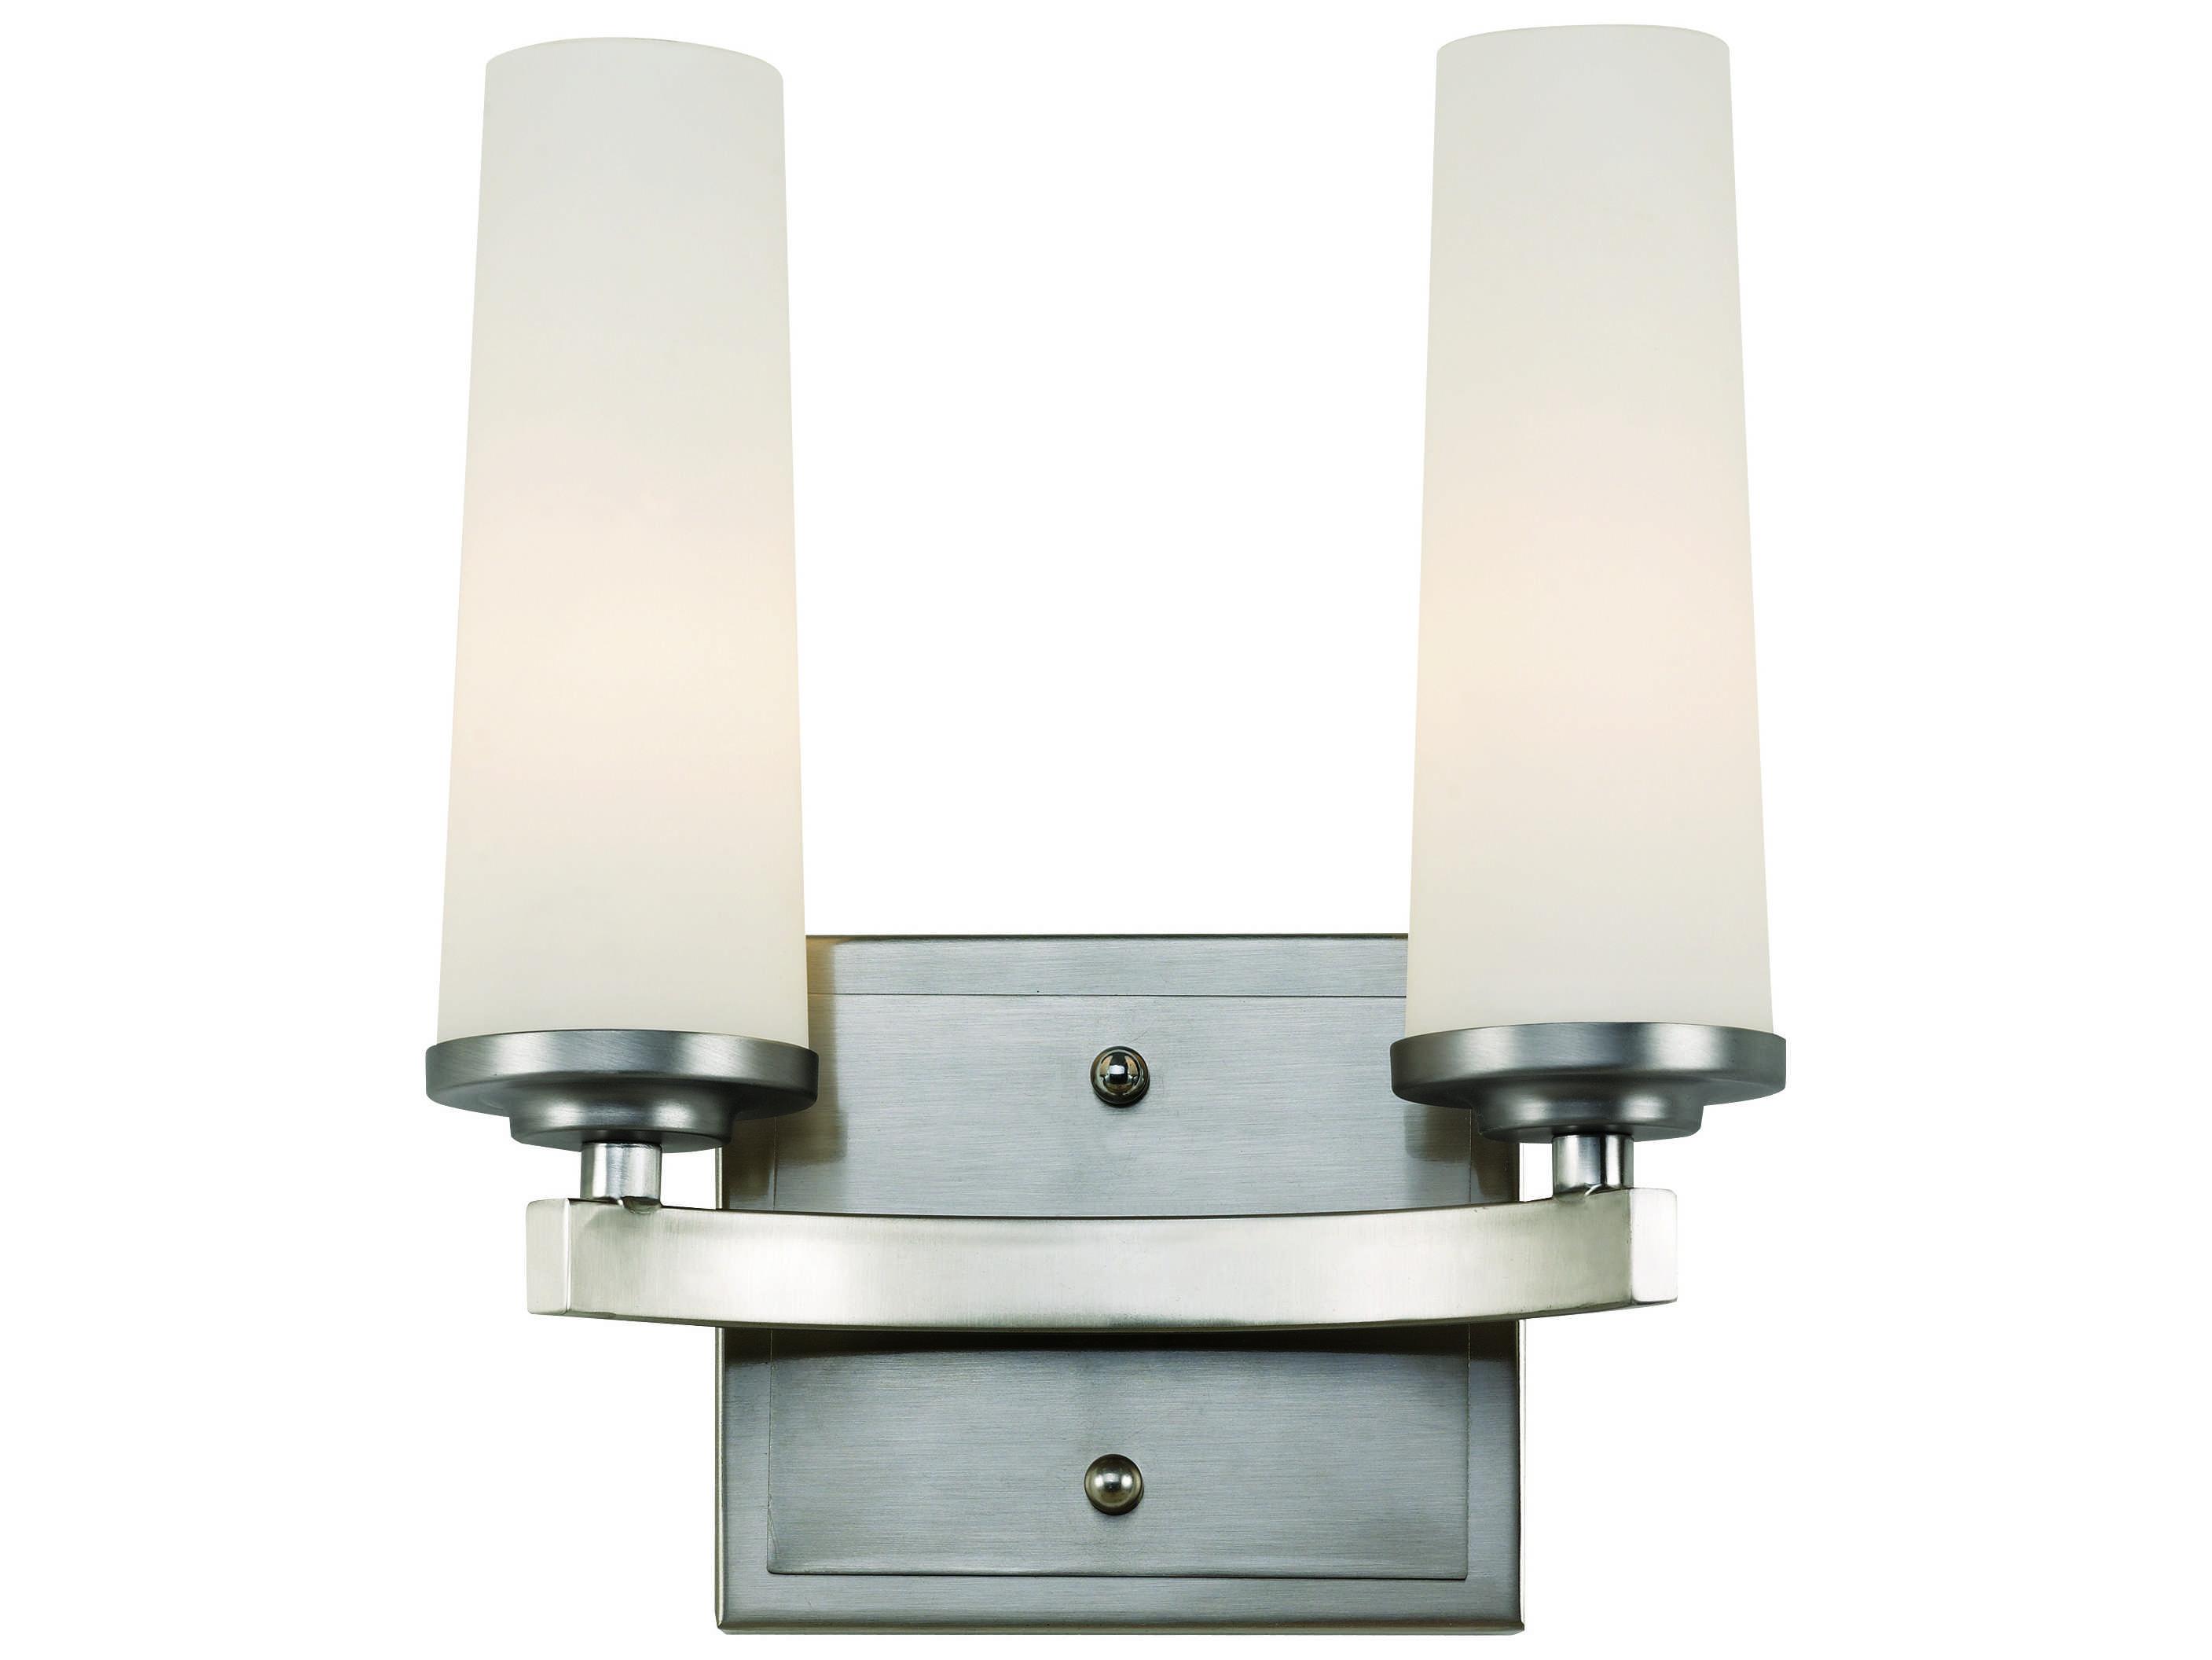 Globes For Vanity Light : Trans Globe Lighting Urban Inspiration Satin Nickel Two-Light Vanity Light 20242-SN